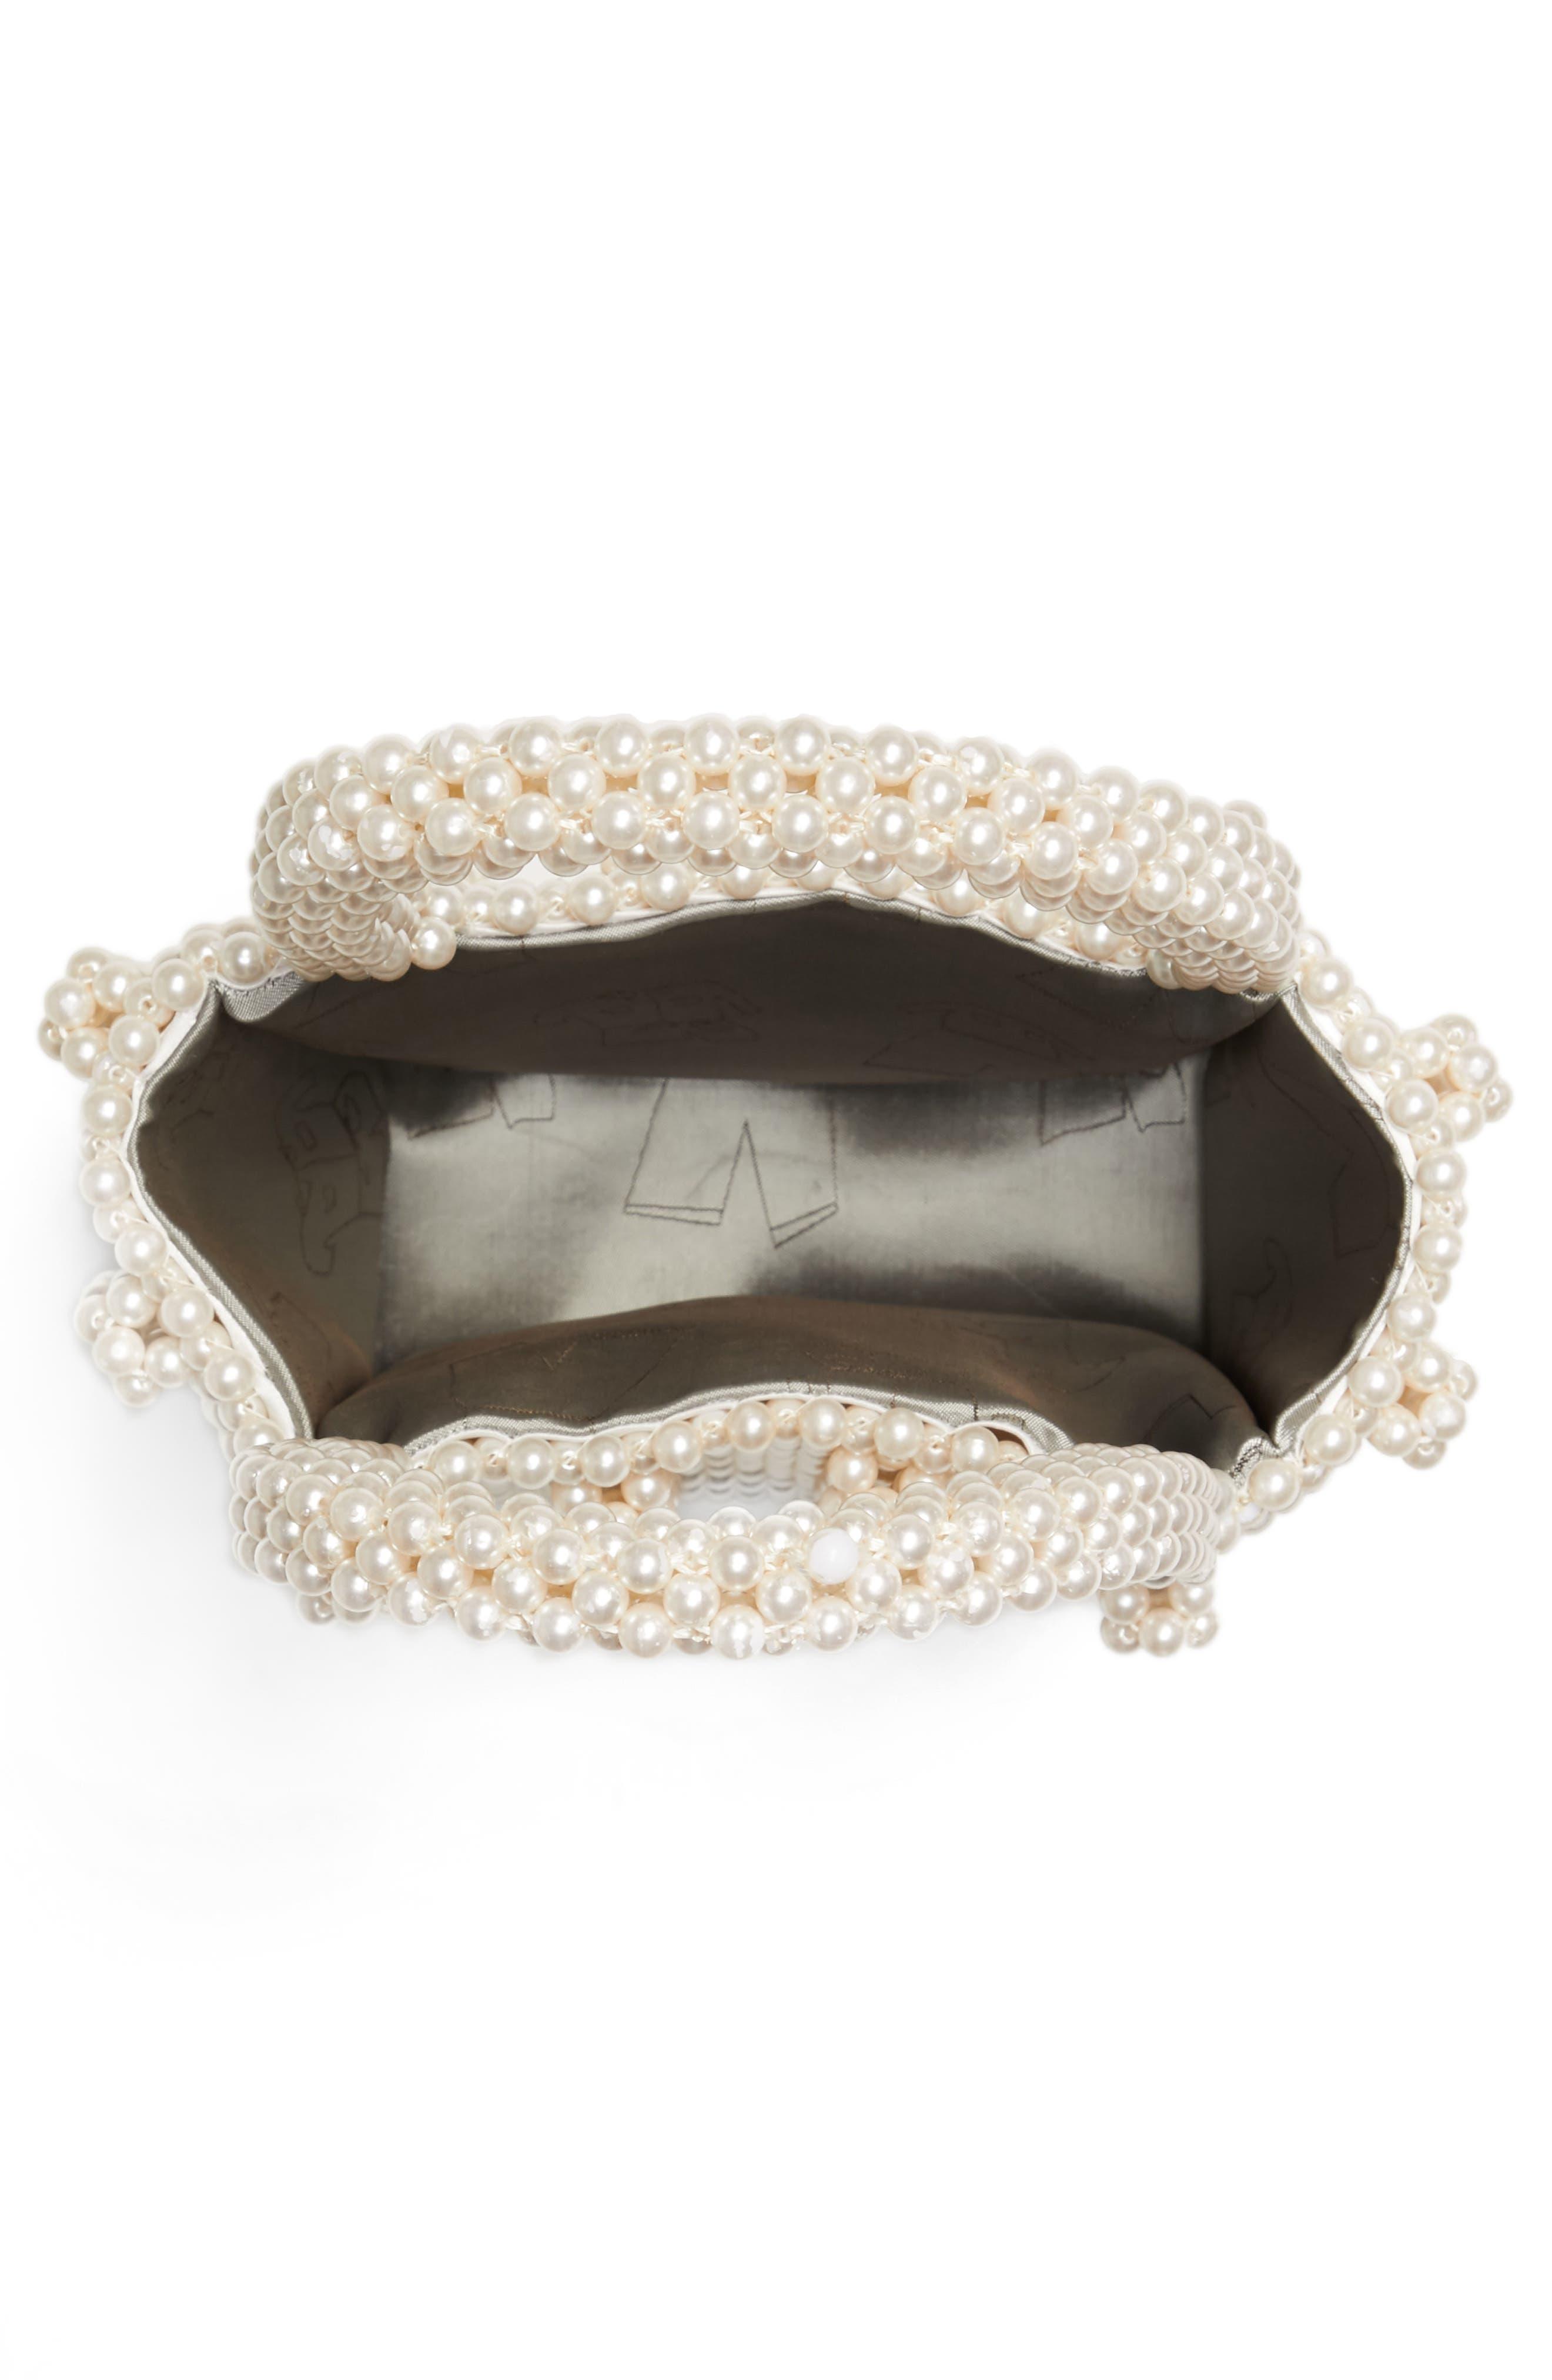 Antonia Small Imitation Pearl Beaded Handbag,                             Alternate thumbnail 5, color,                             Cream